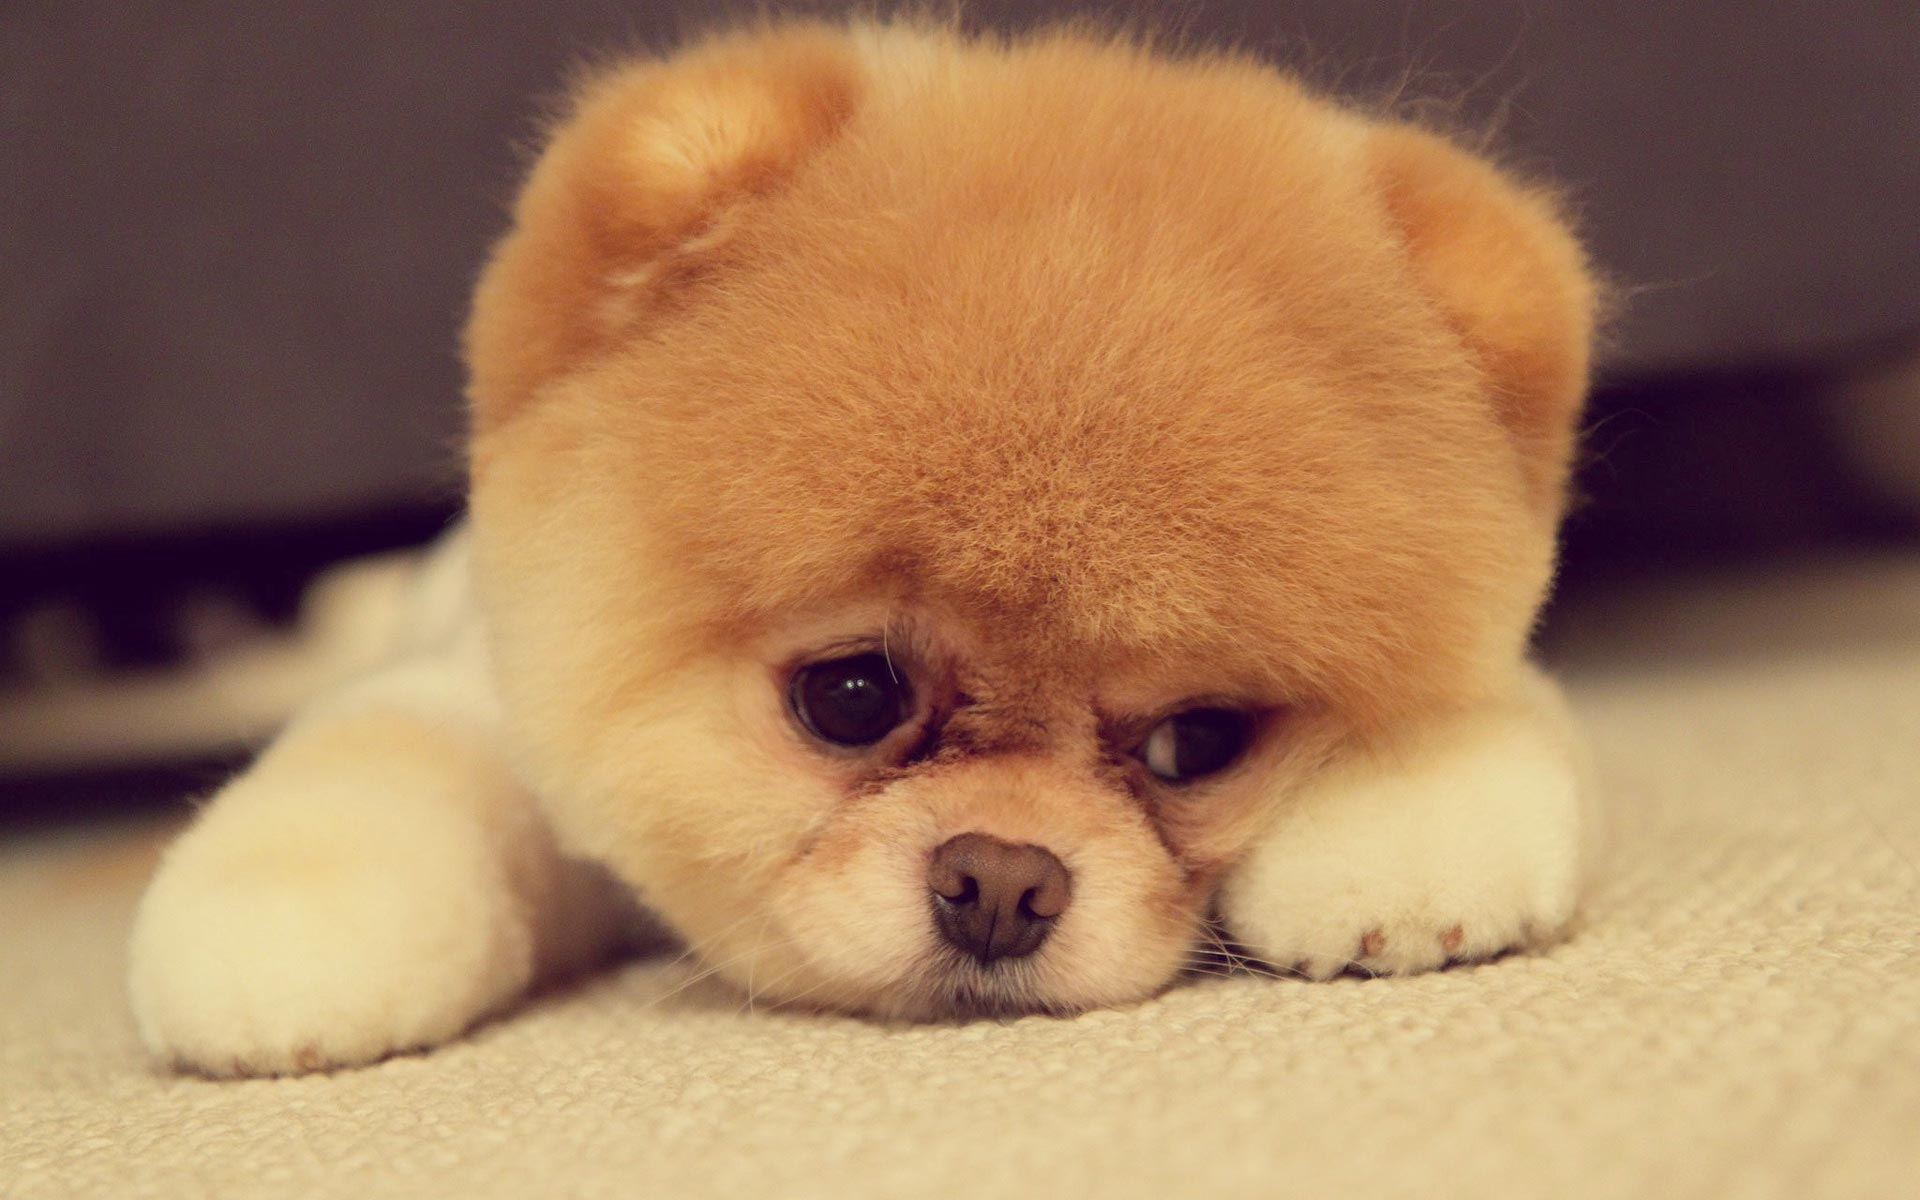 Pomeranian Puppy cute sad face Lazer Horse